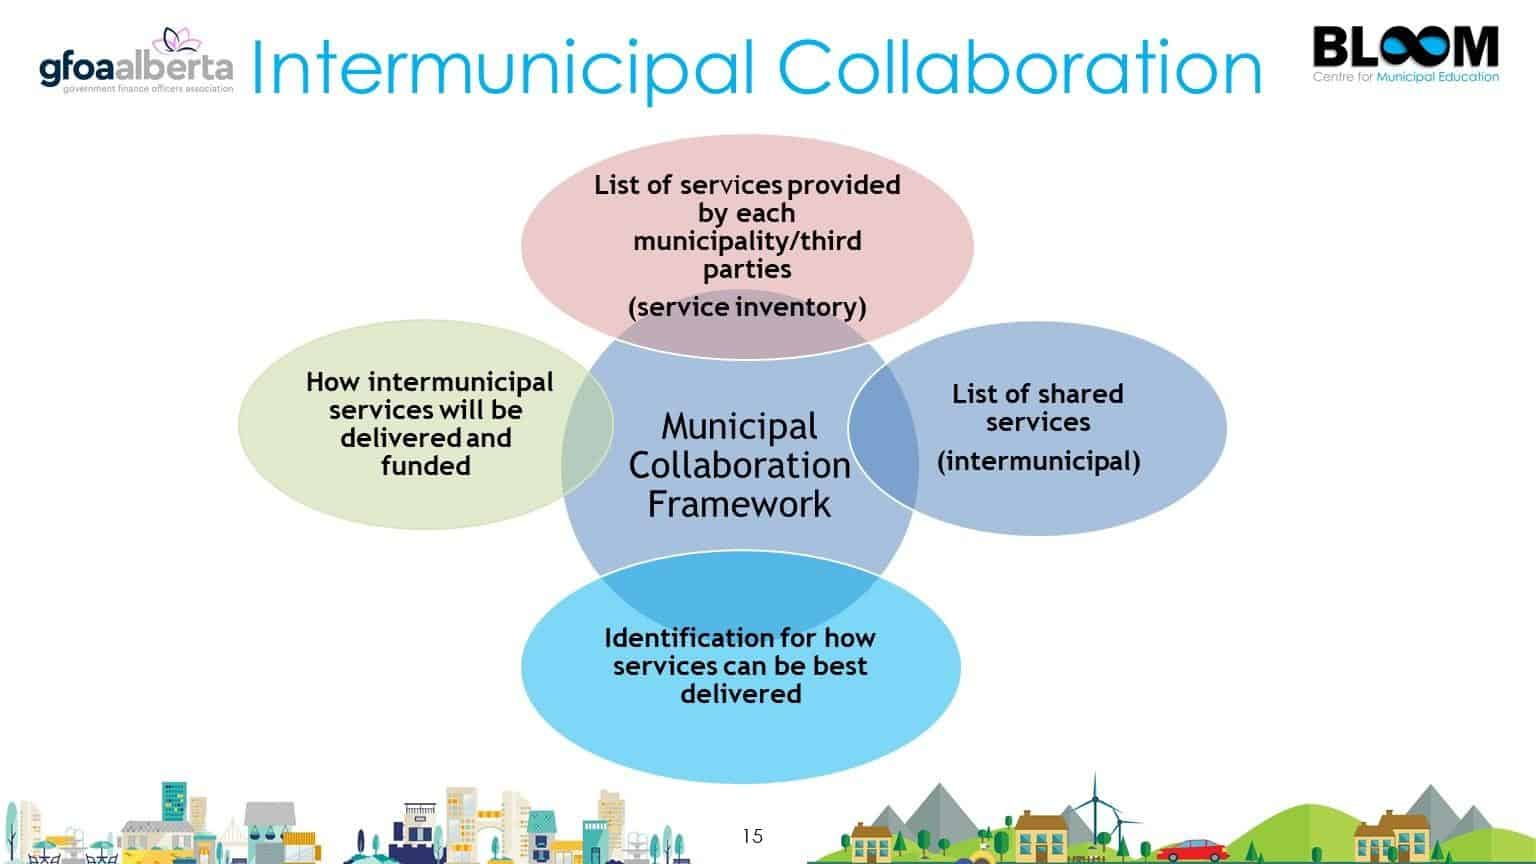 Intermunicipal collaboration